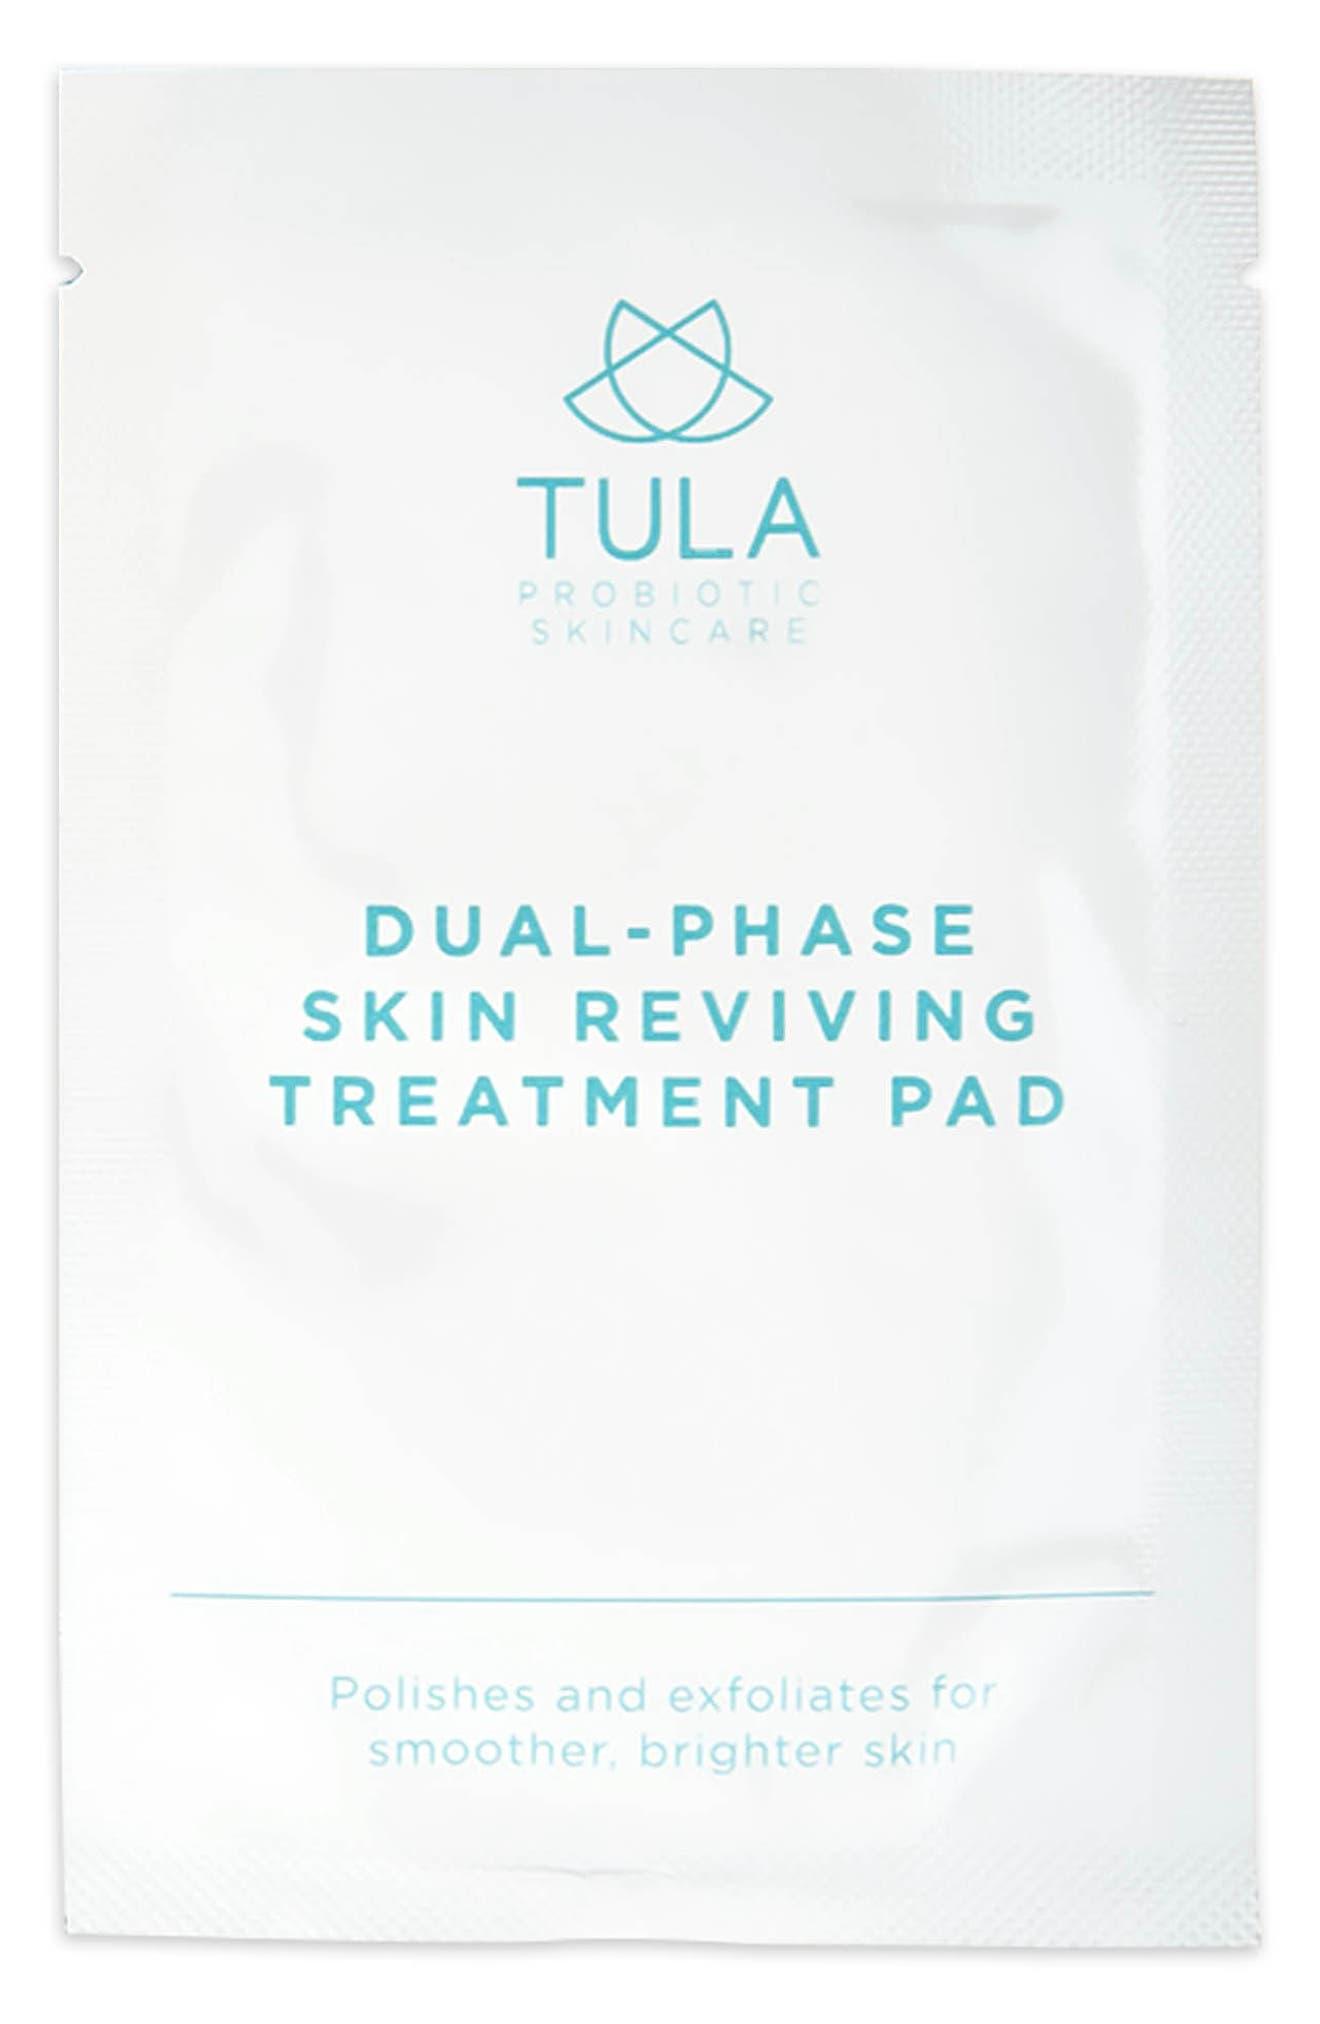 TULA PROBIOTIC SKINCARE, Dual Phase Skin Reviving Treatment Pads, Alternate thumbnail 2, color, NO COLOR